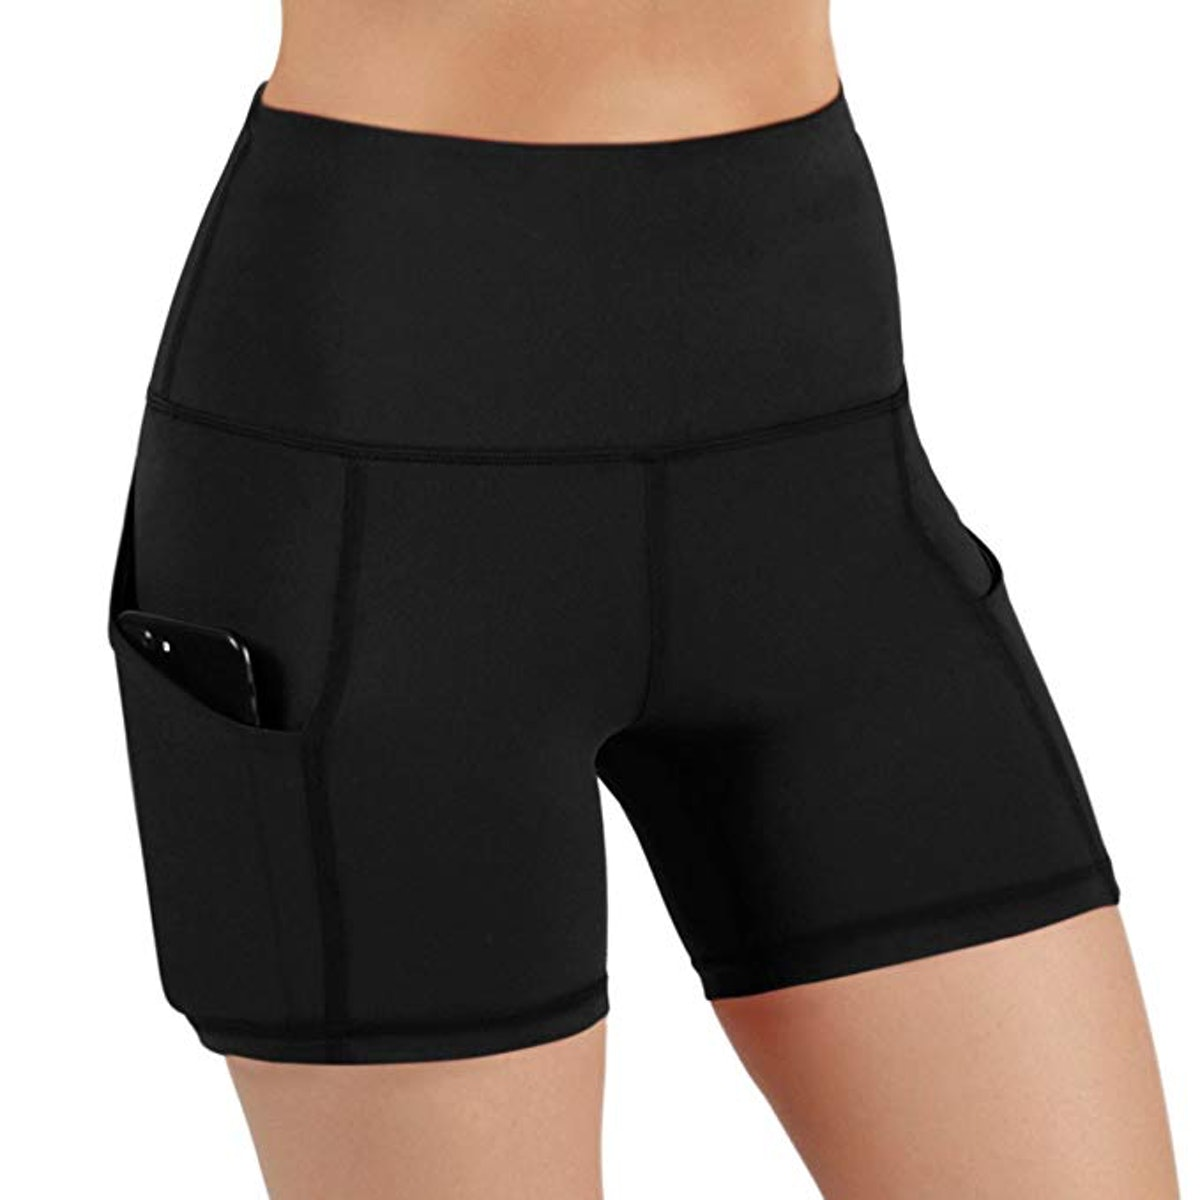 ODODOS High-Waist Yoga & Running Shorts